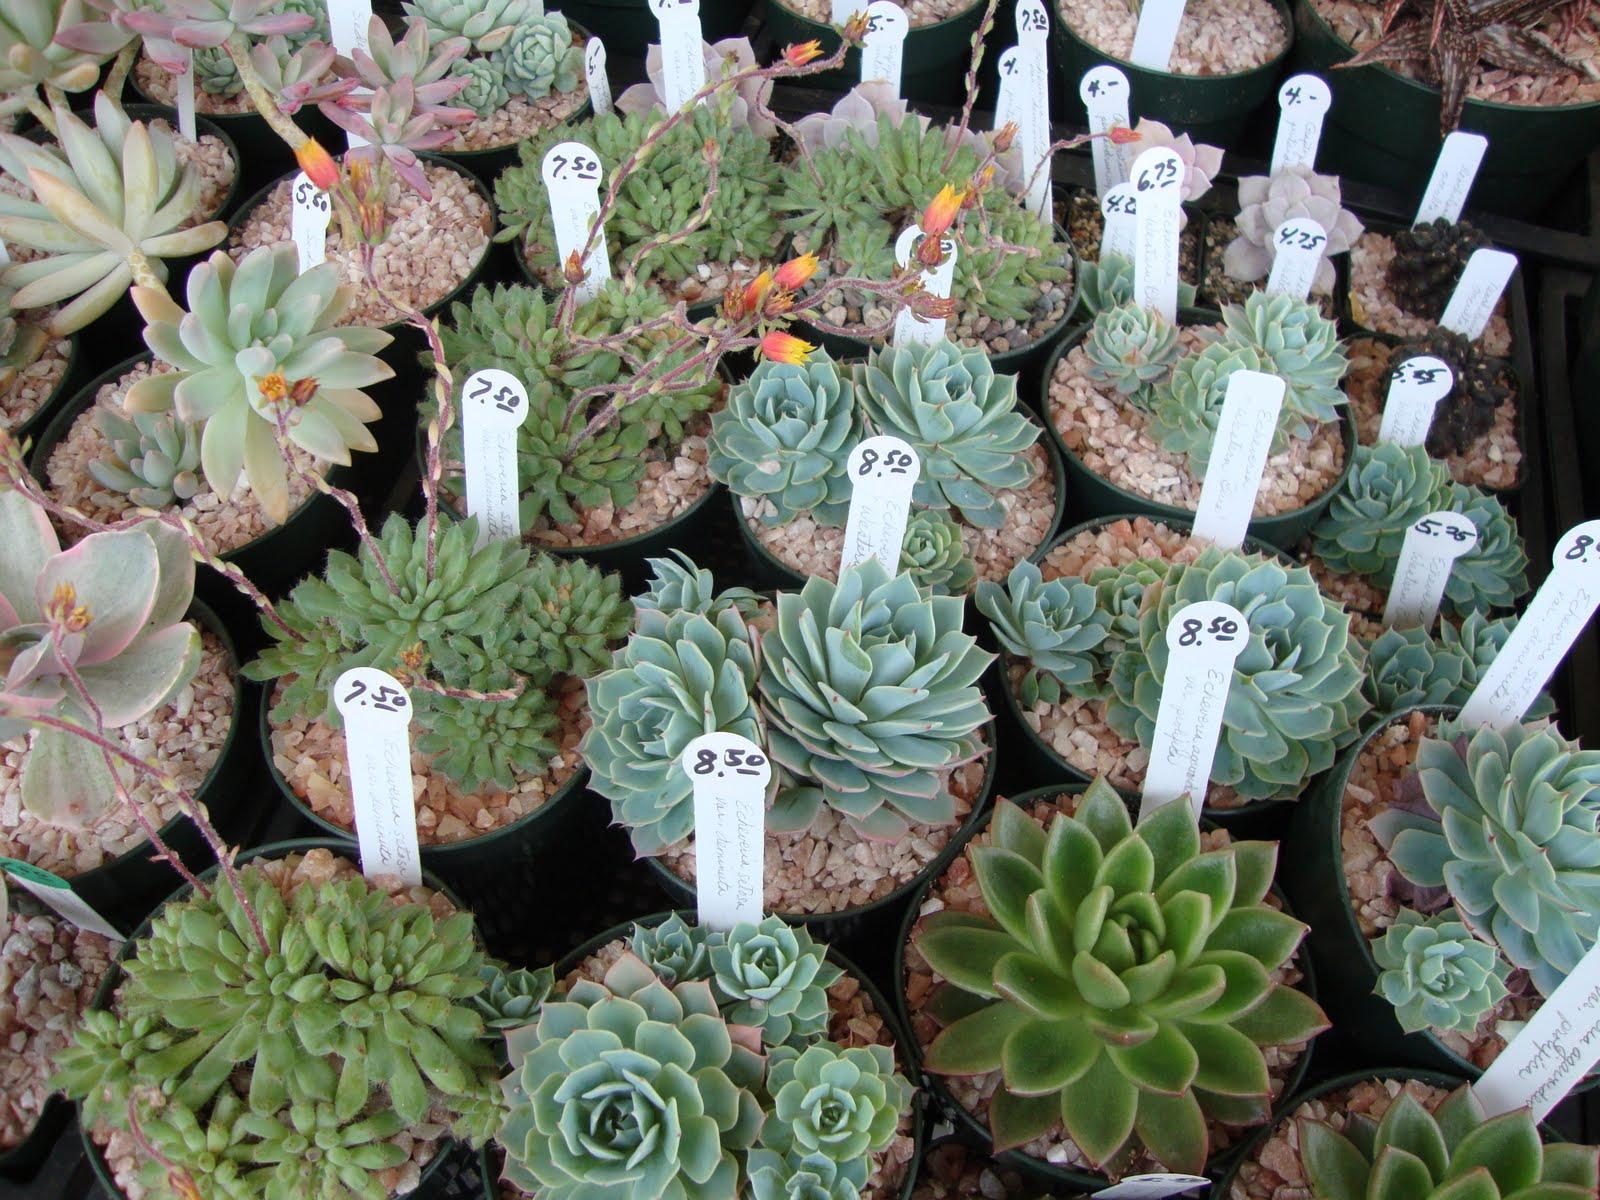 danger garden oregon cactus succulent society show and sale. Black Bedroom Furniture Sets. Home Design Ideas